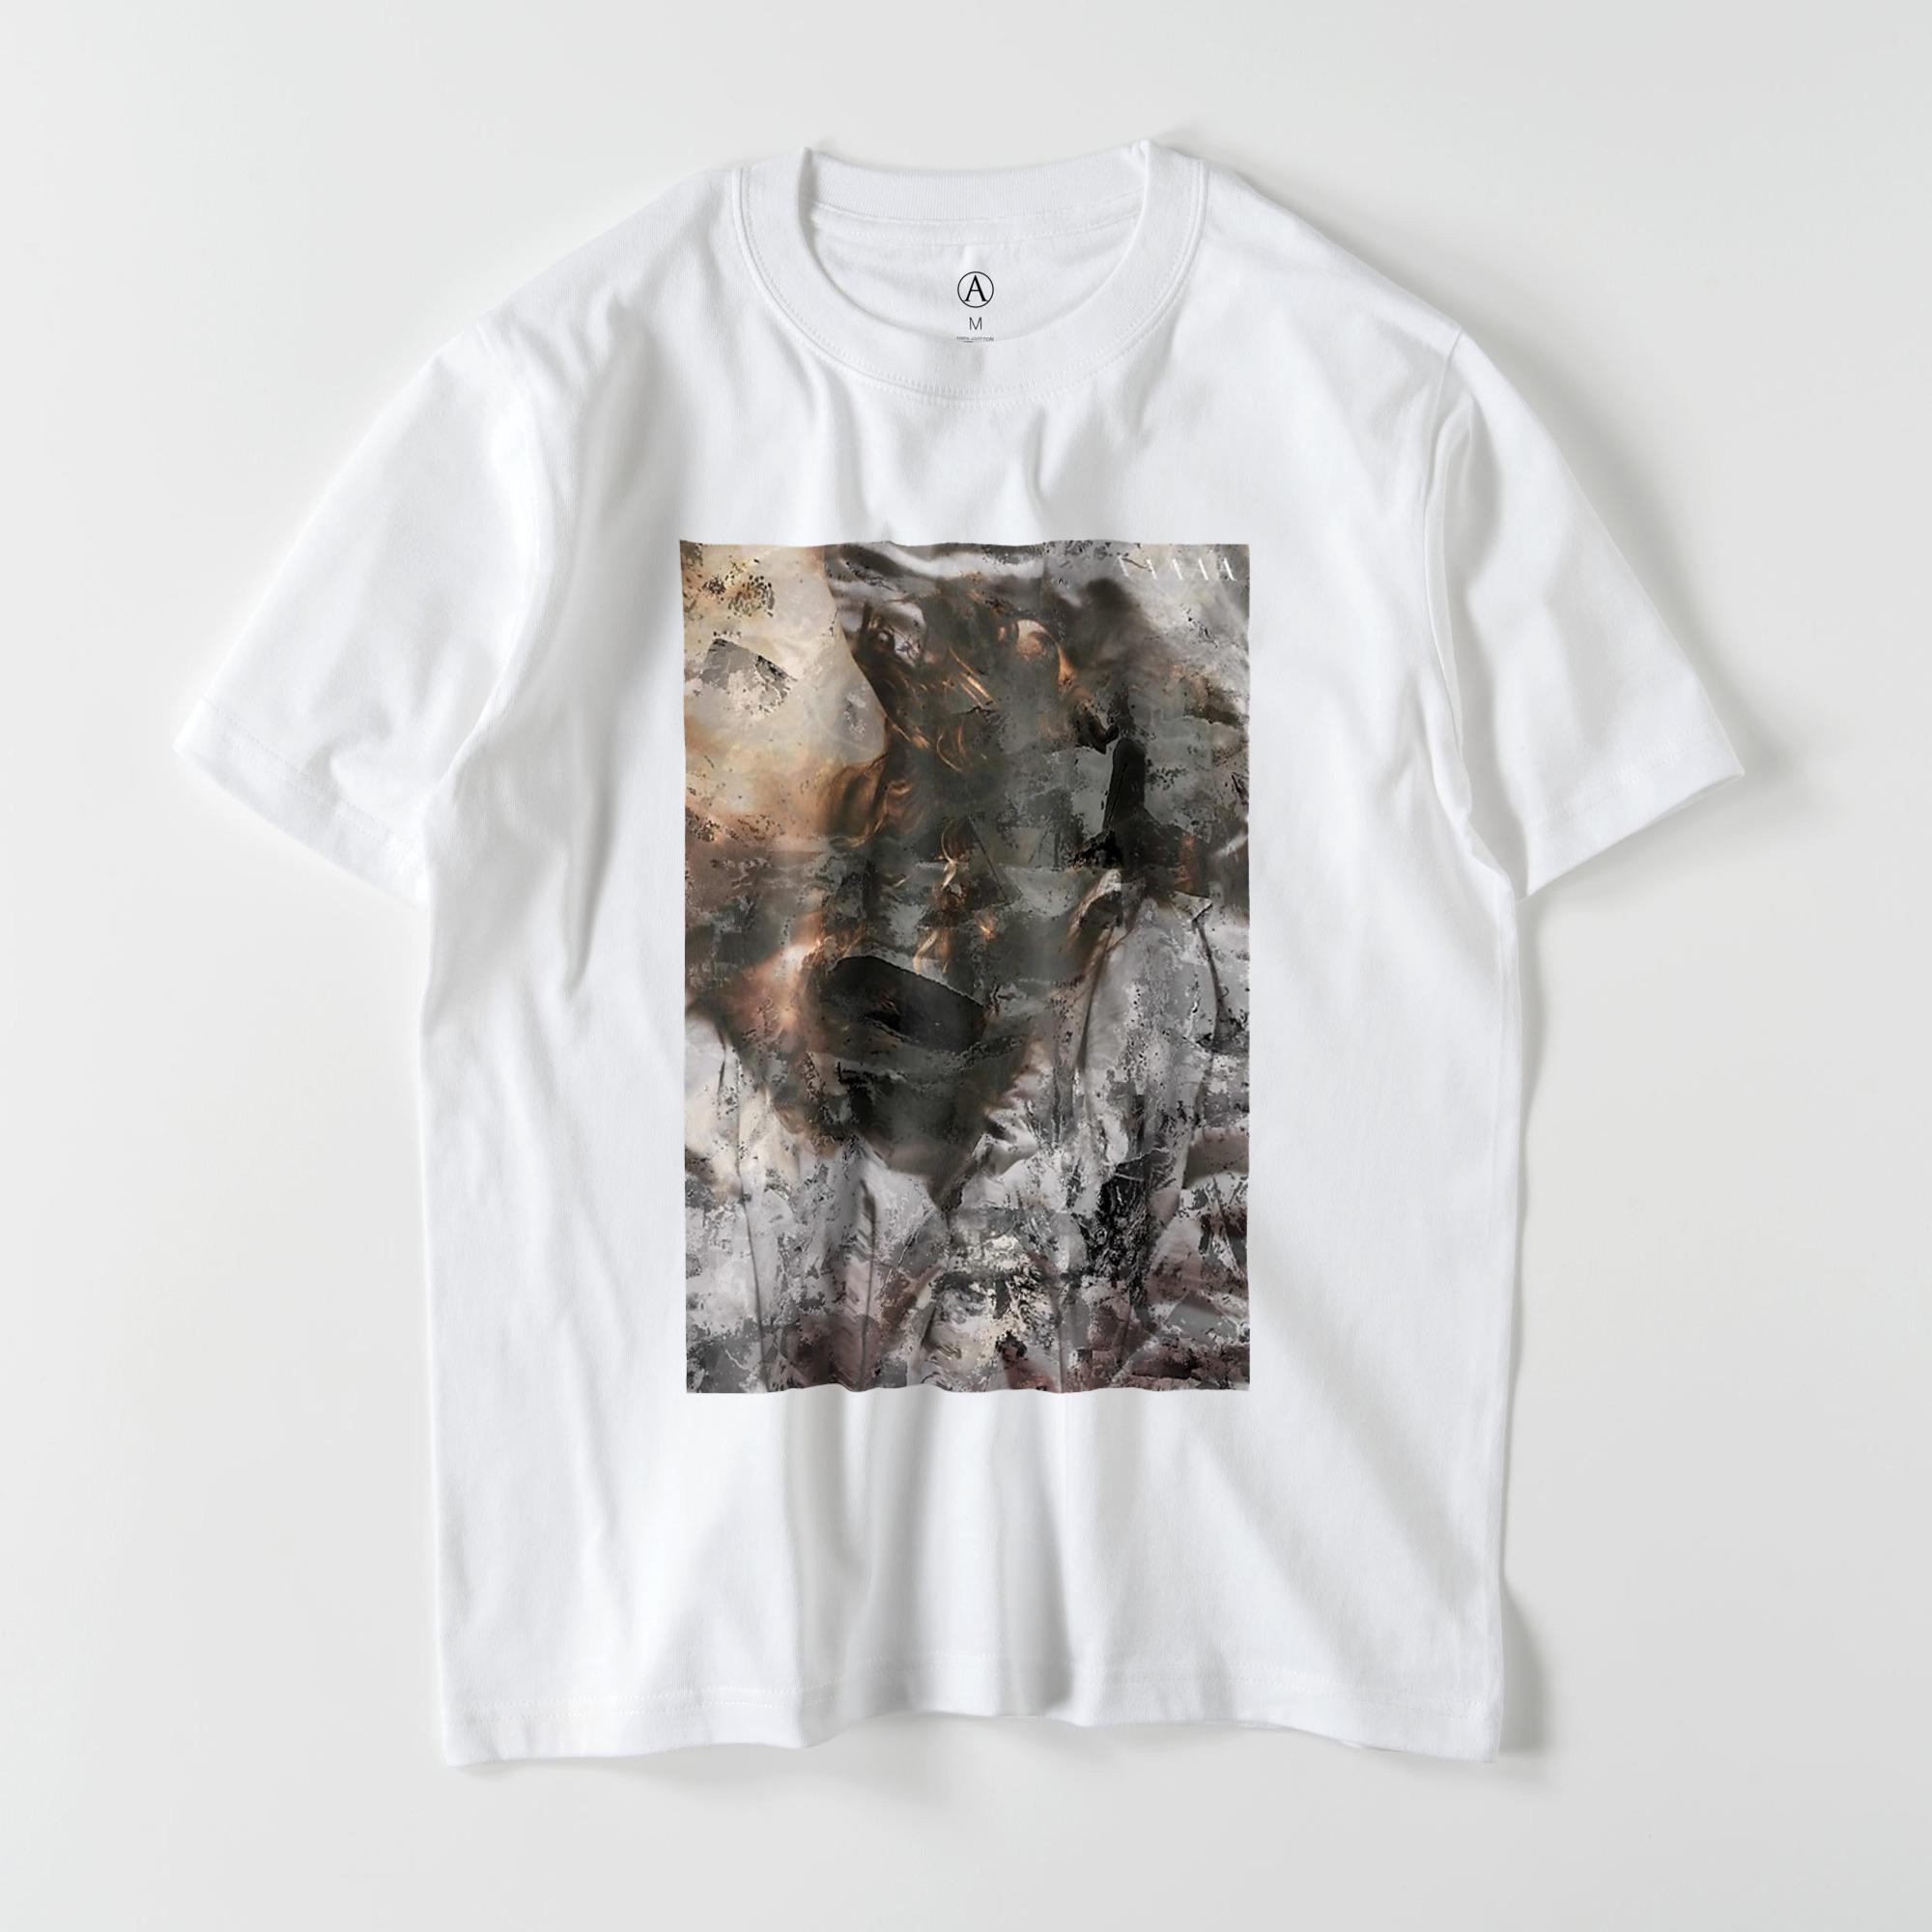 Beautiful スタンダードTシャツ /男女兼用(4色)